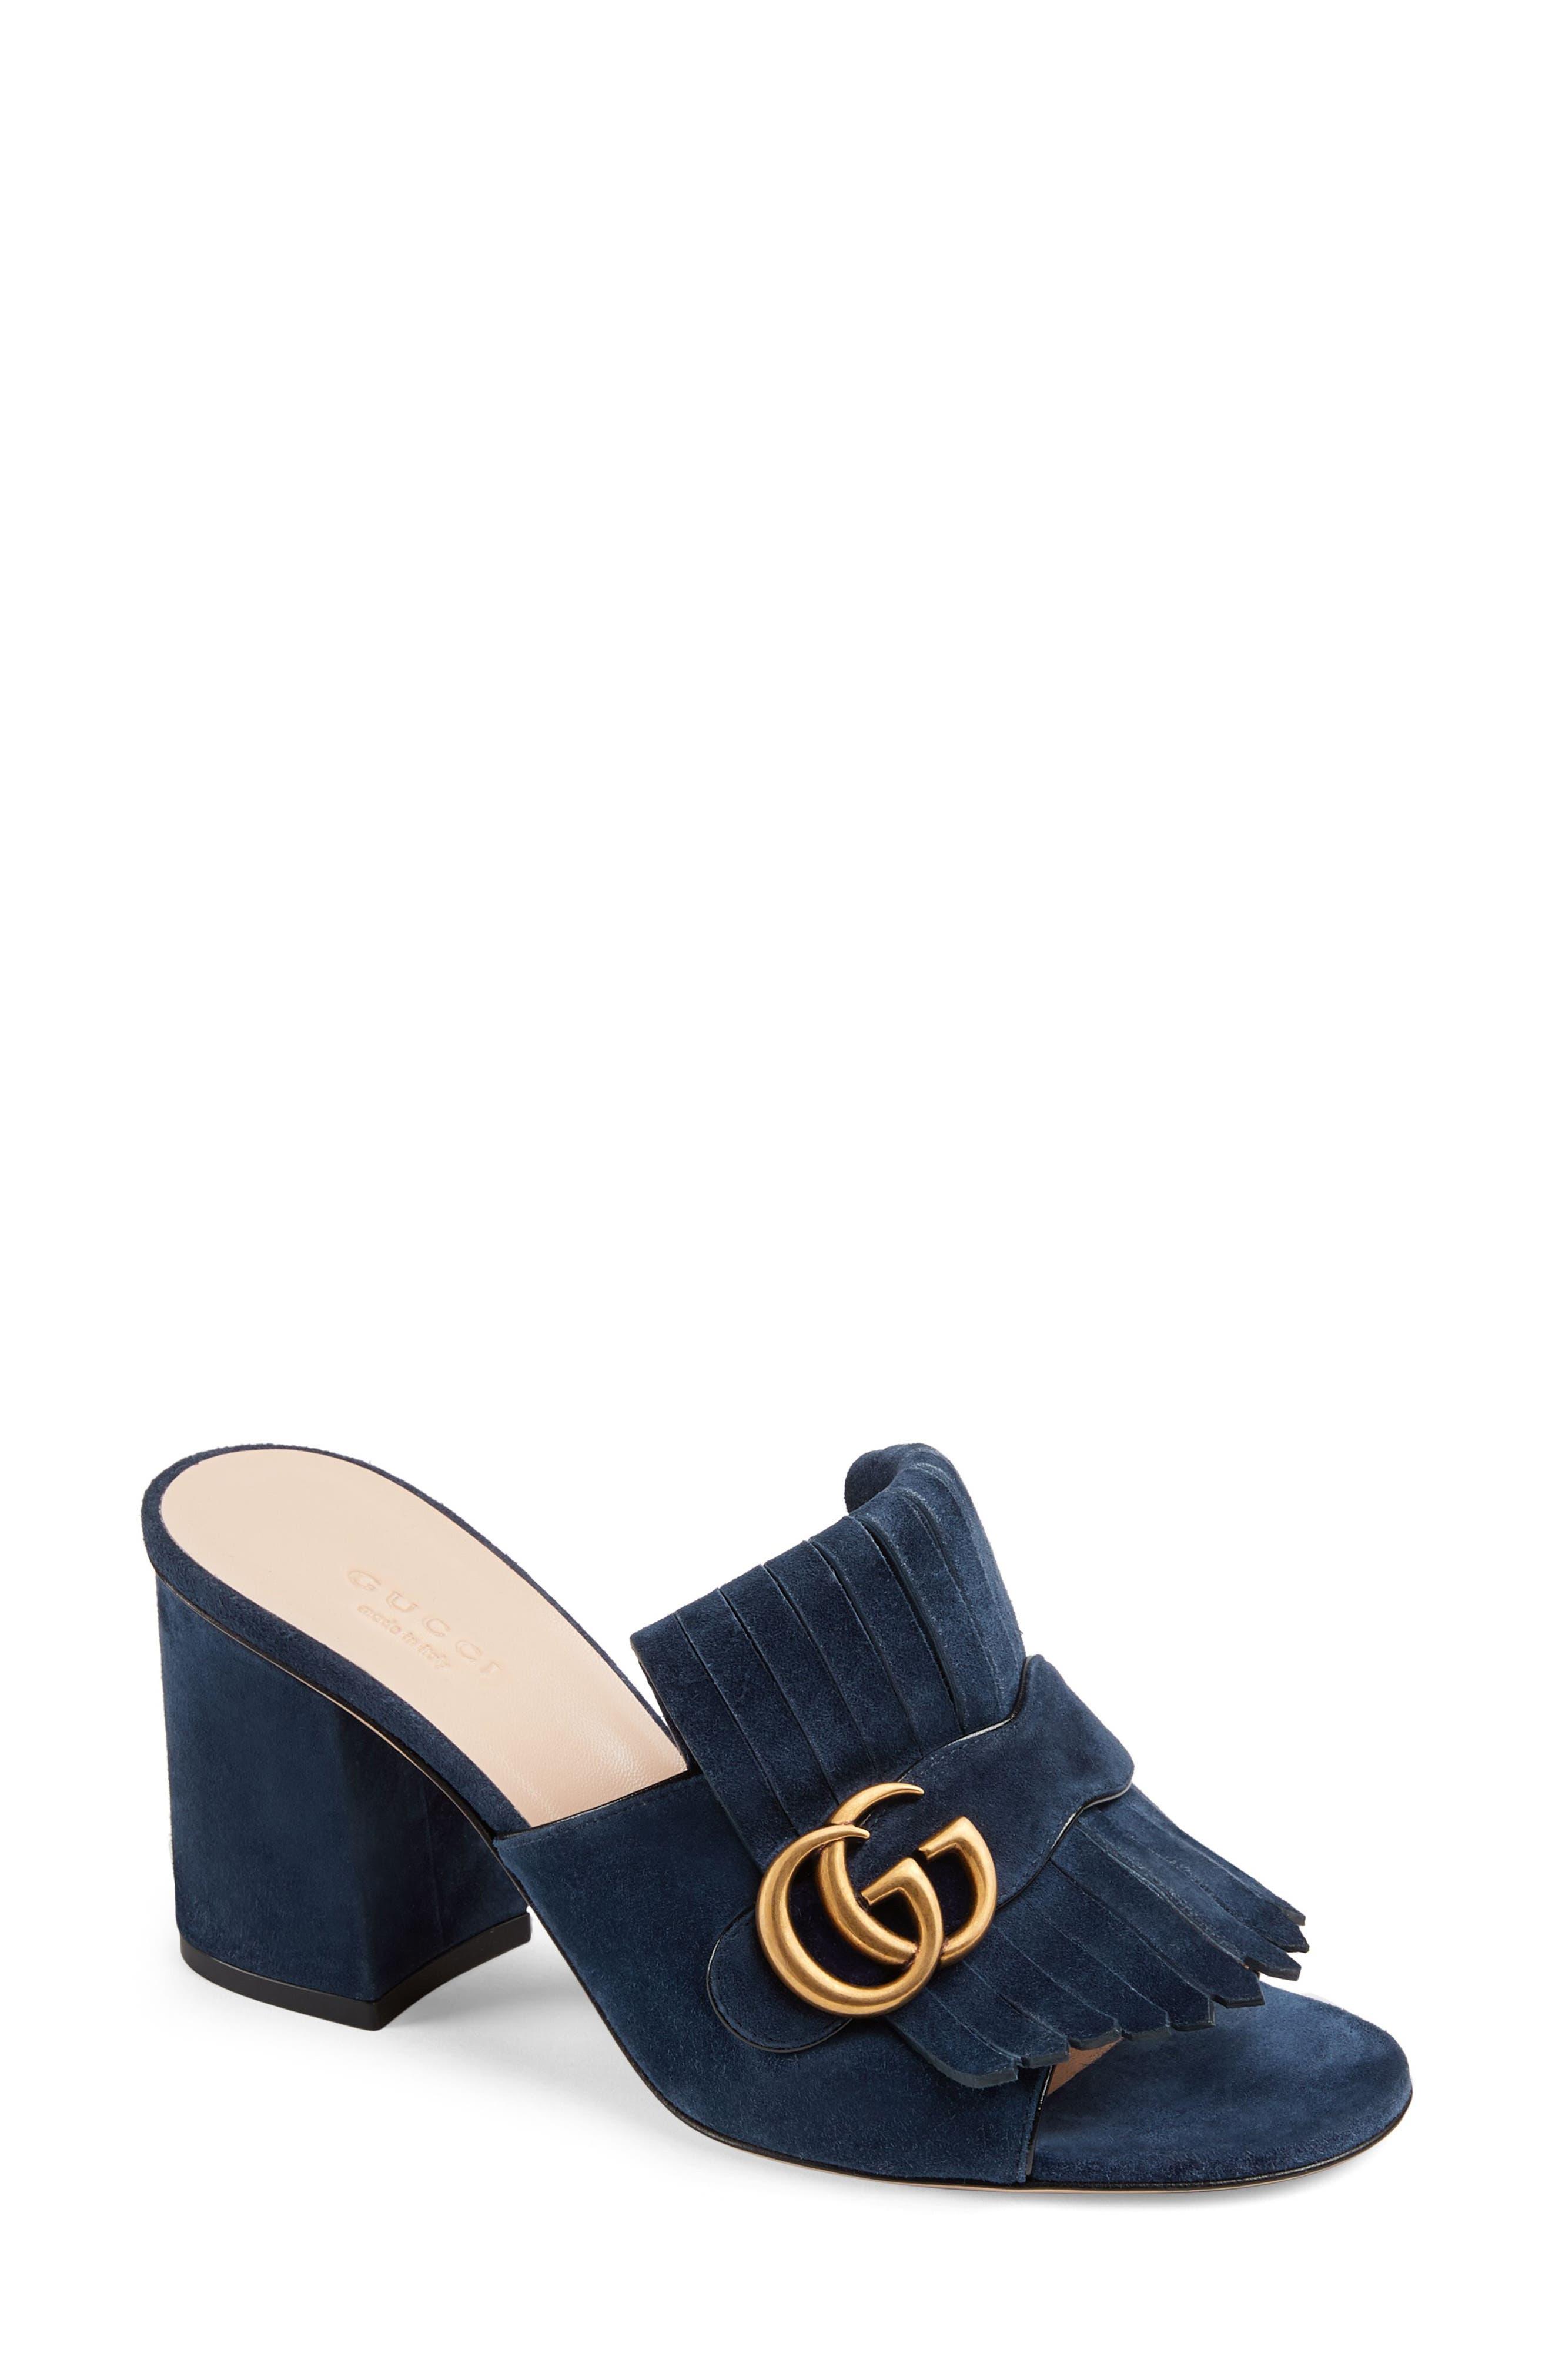 Gucci Gg Marmont Peep Toe Mule - Blue